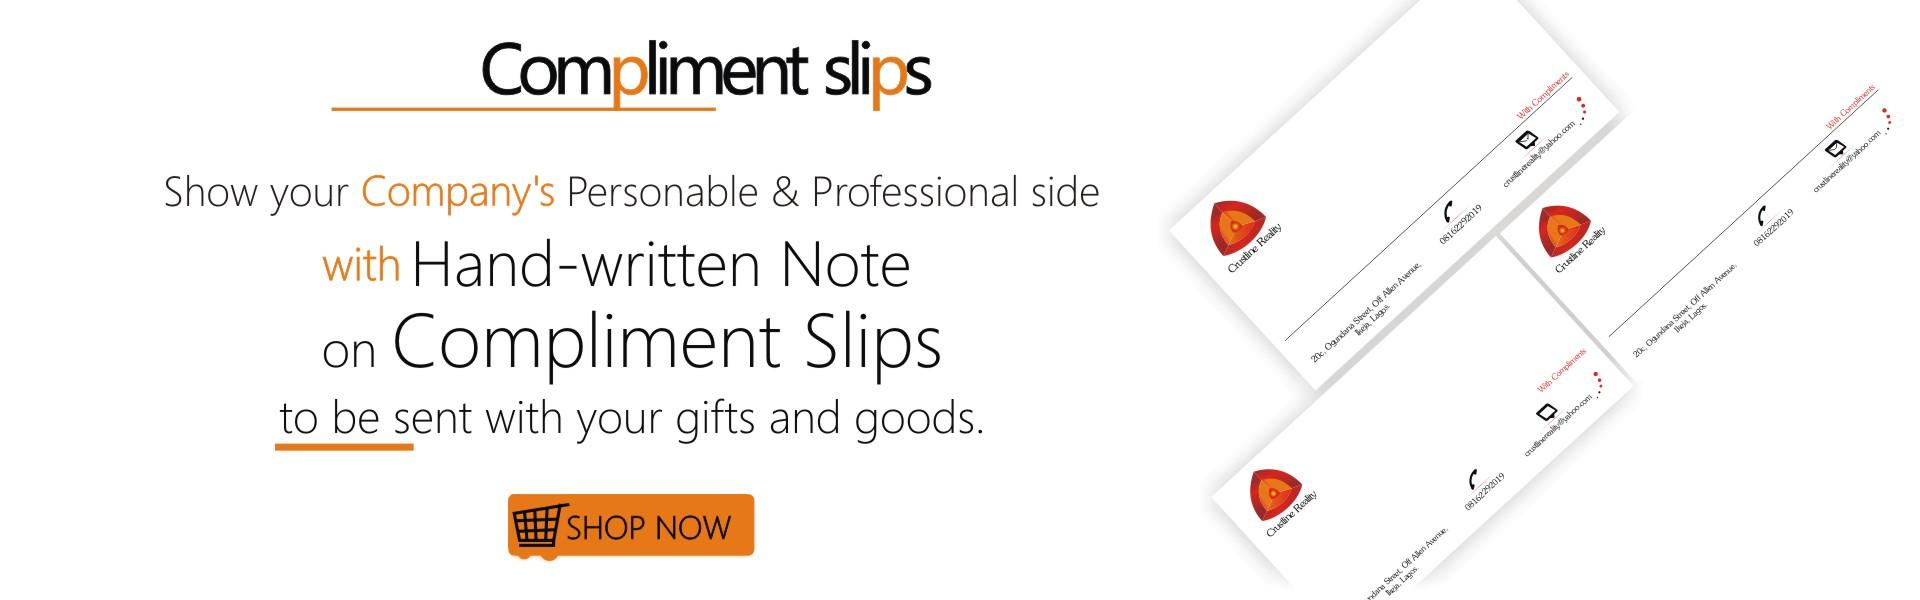 Compliment Slip